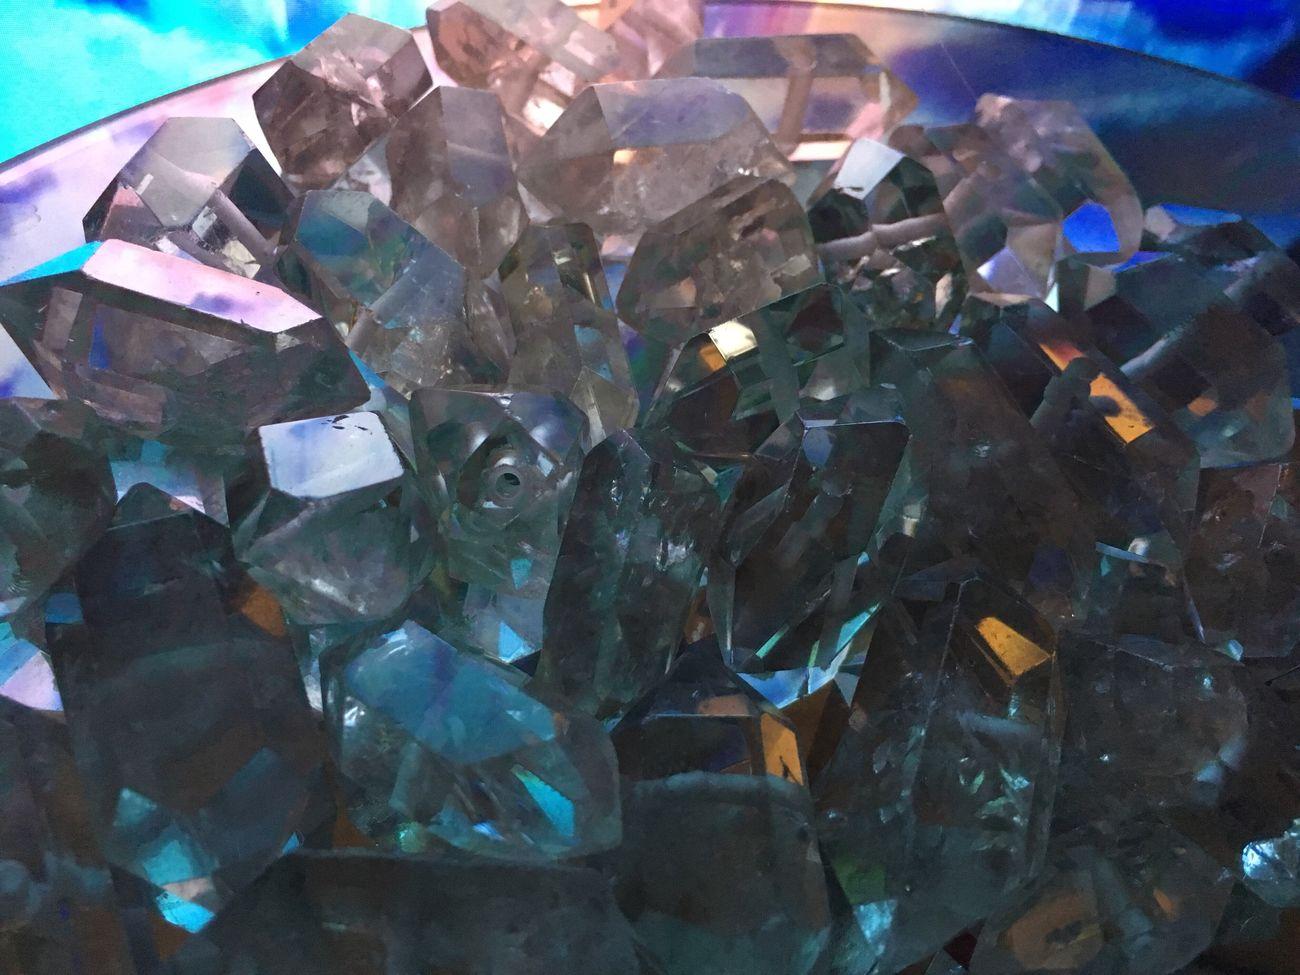 Crystals Crystal Quartz Gems Mineral Gemstone  Precious Gem Close-up Indoors  Rock Stone Cave Treasure Pile Mound Heap Transparent Crystal Clear Crystals